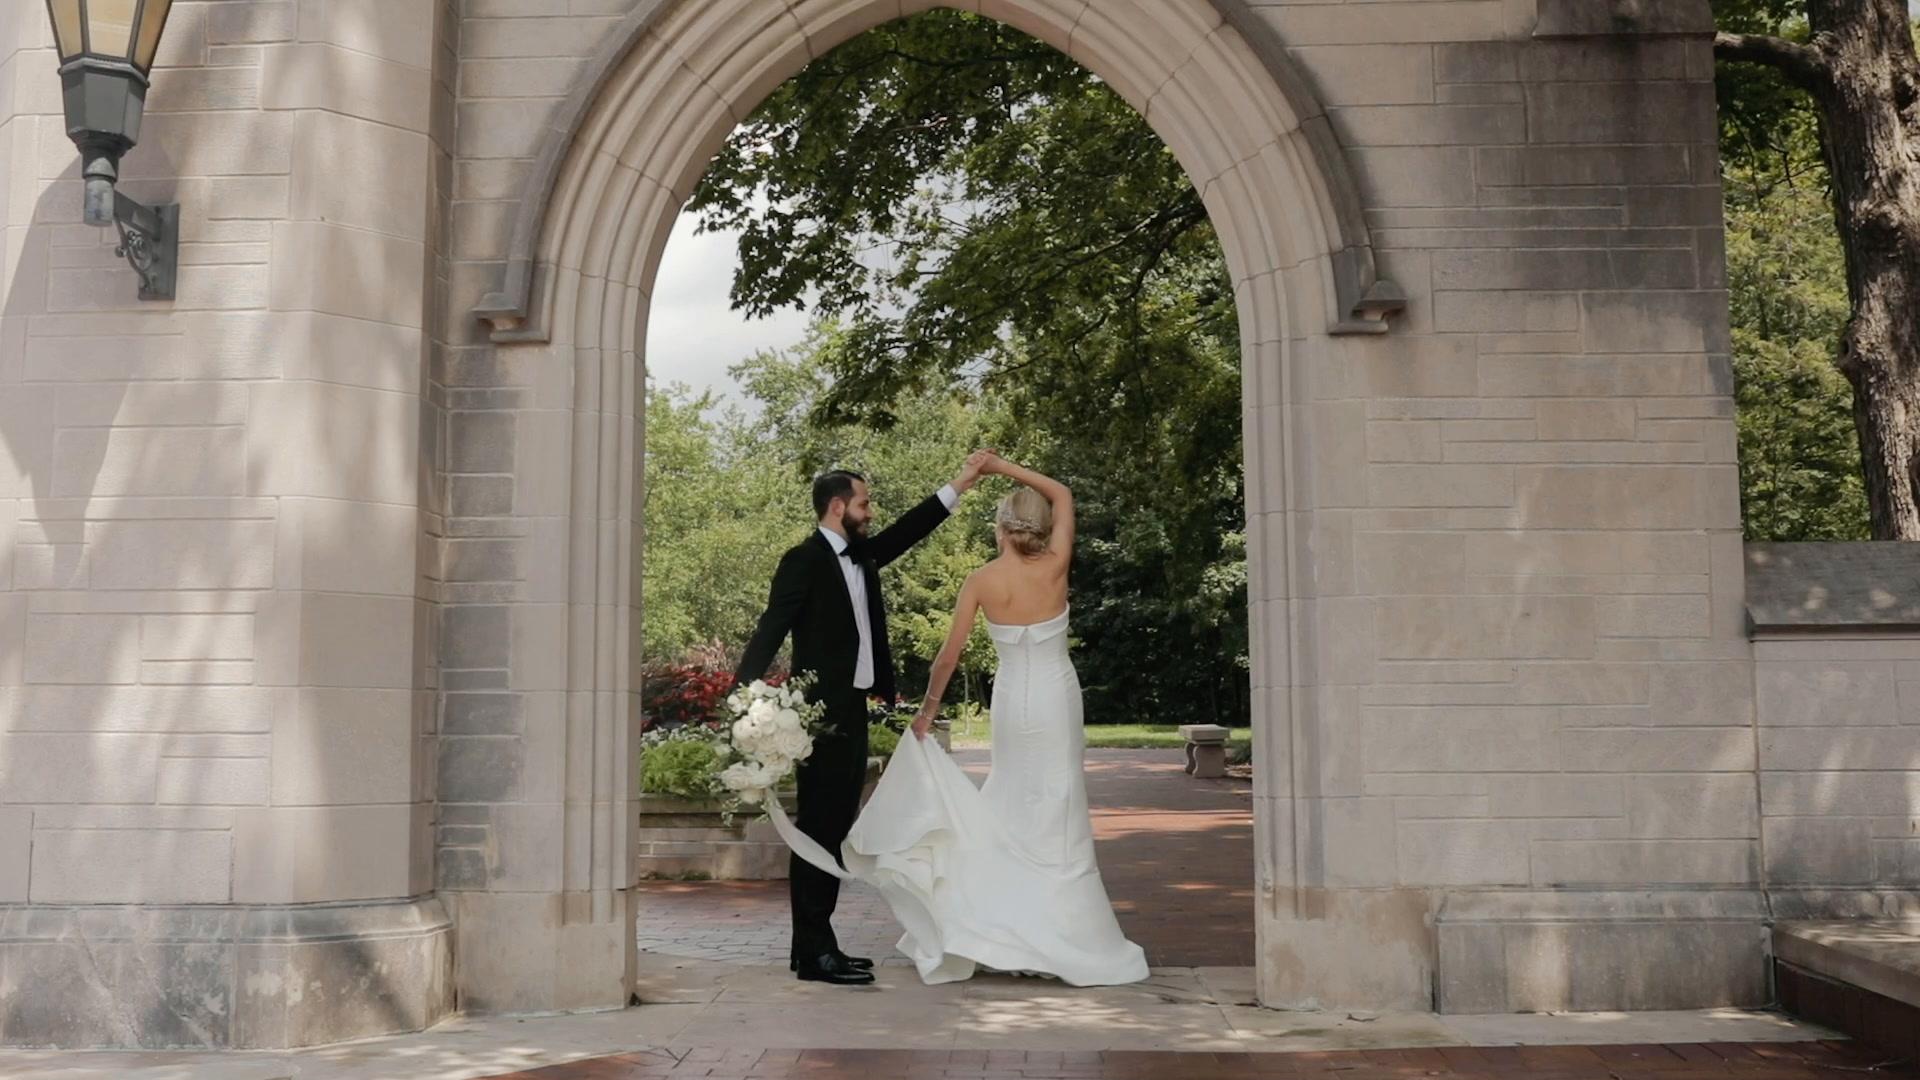 Katlynne + Adam   Bloomington, Indiana   Indiana Memorial Union